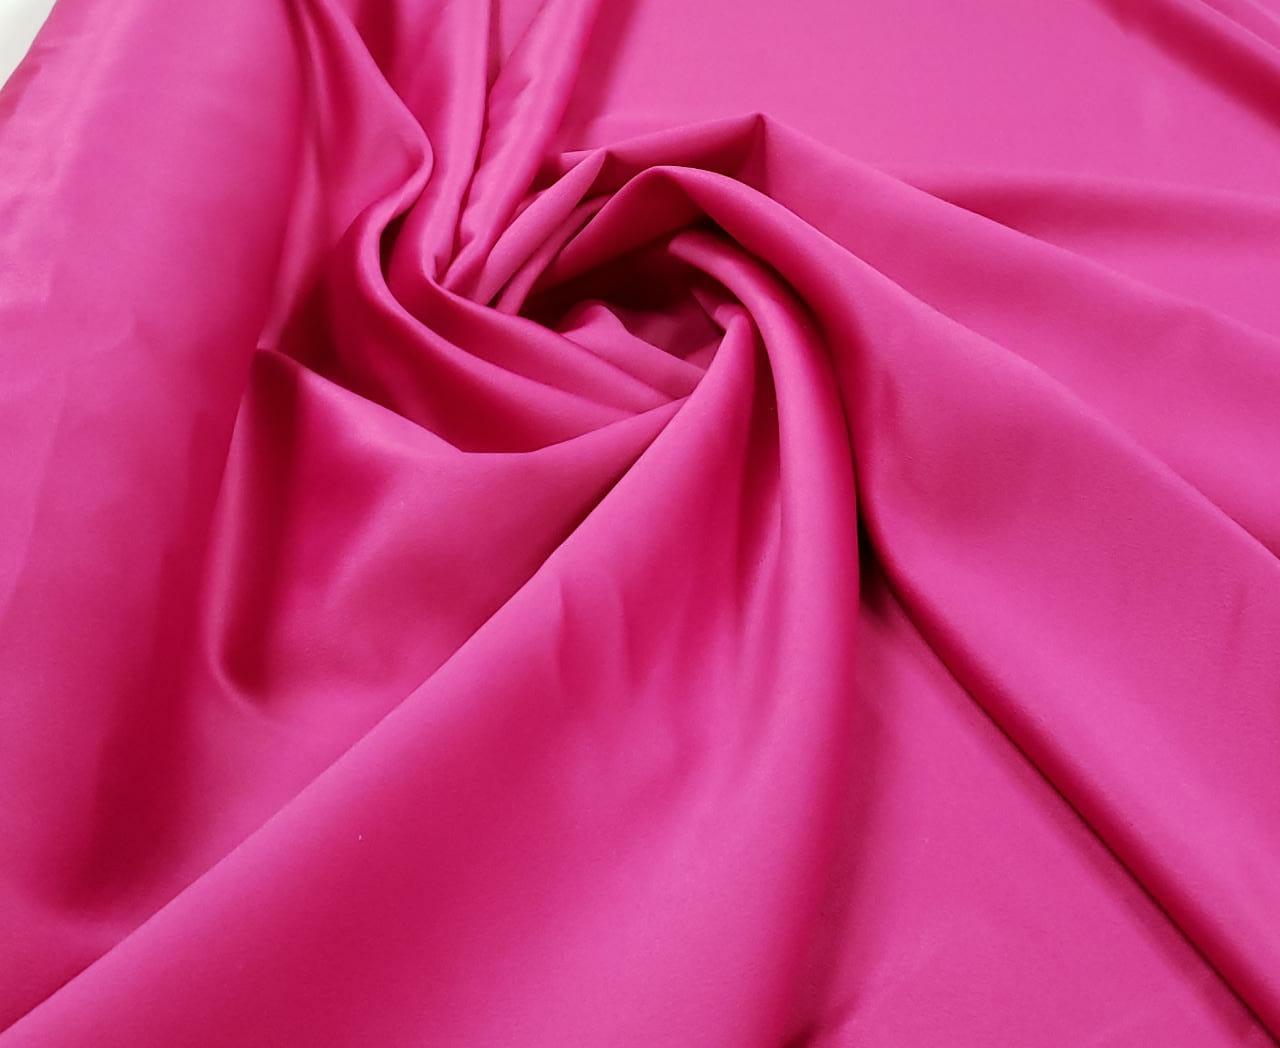 Crepe Pasquale Liso Pink